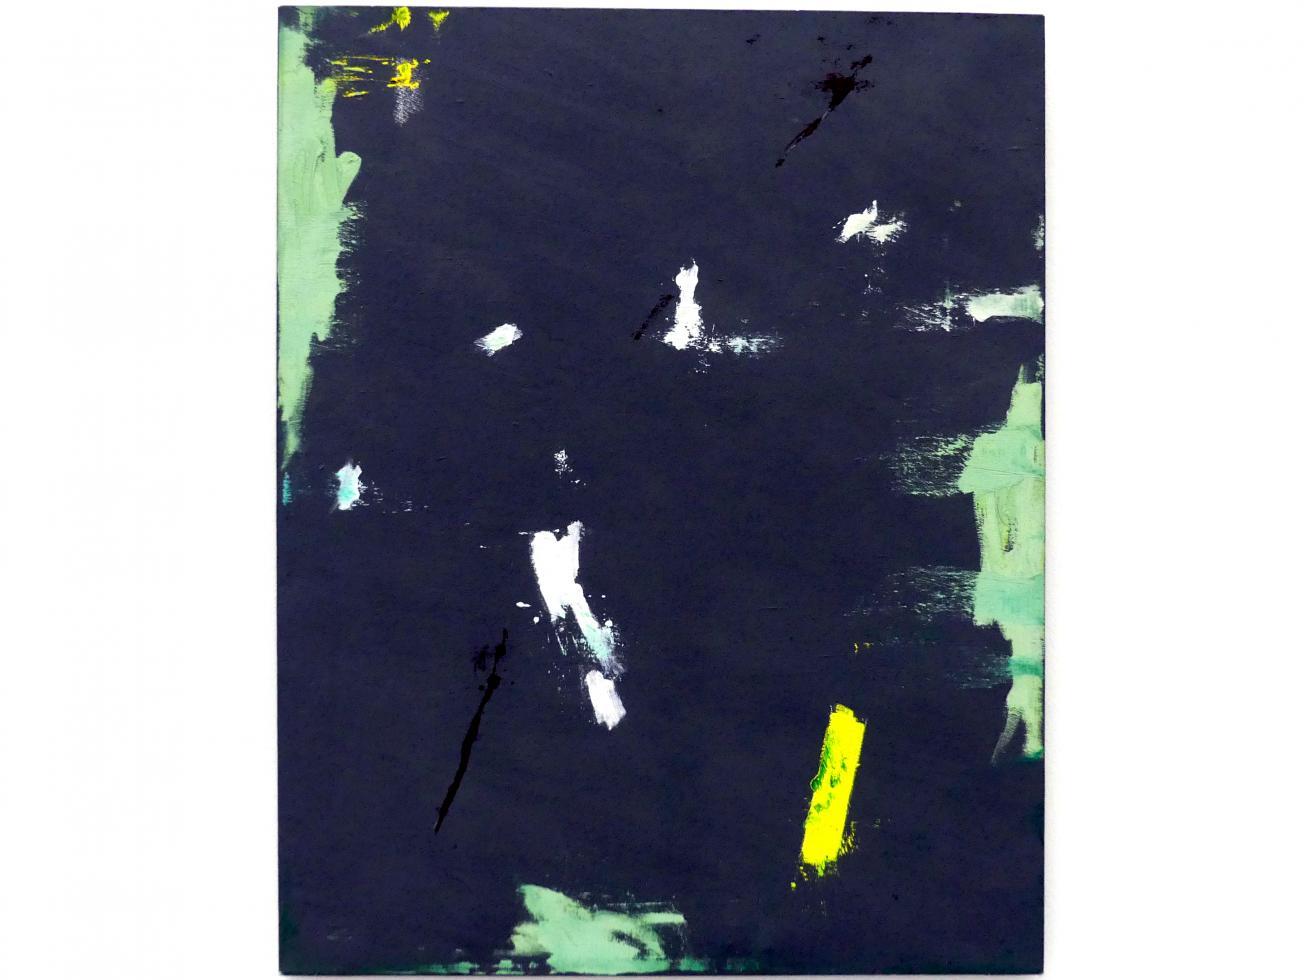 Raoul De Keyser: Untitled, 1983 - 1984